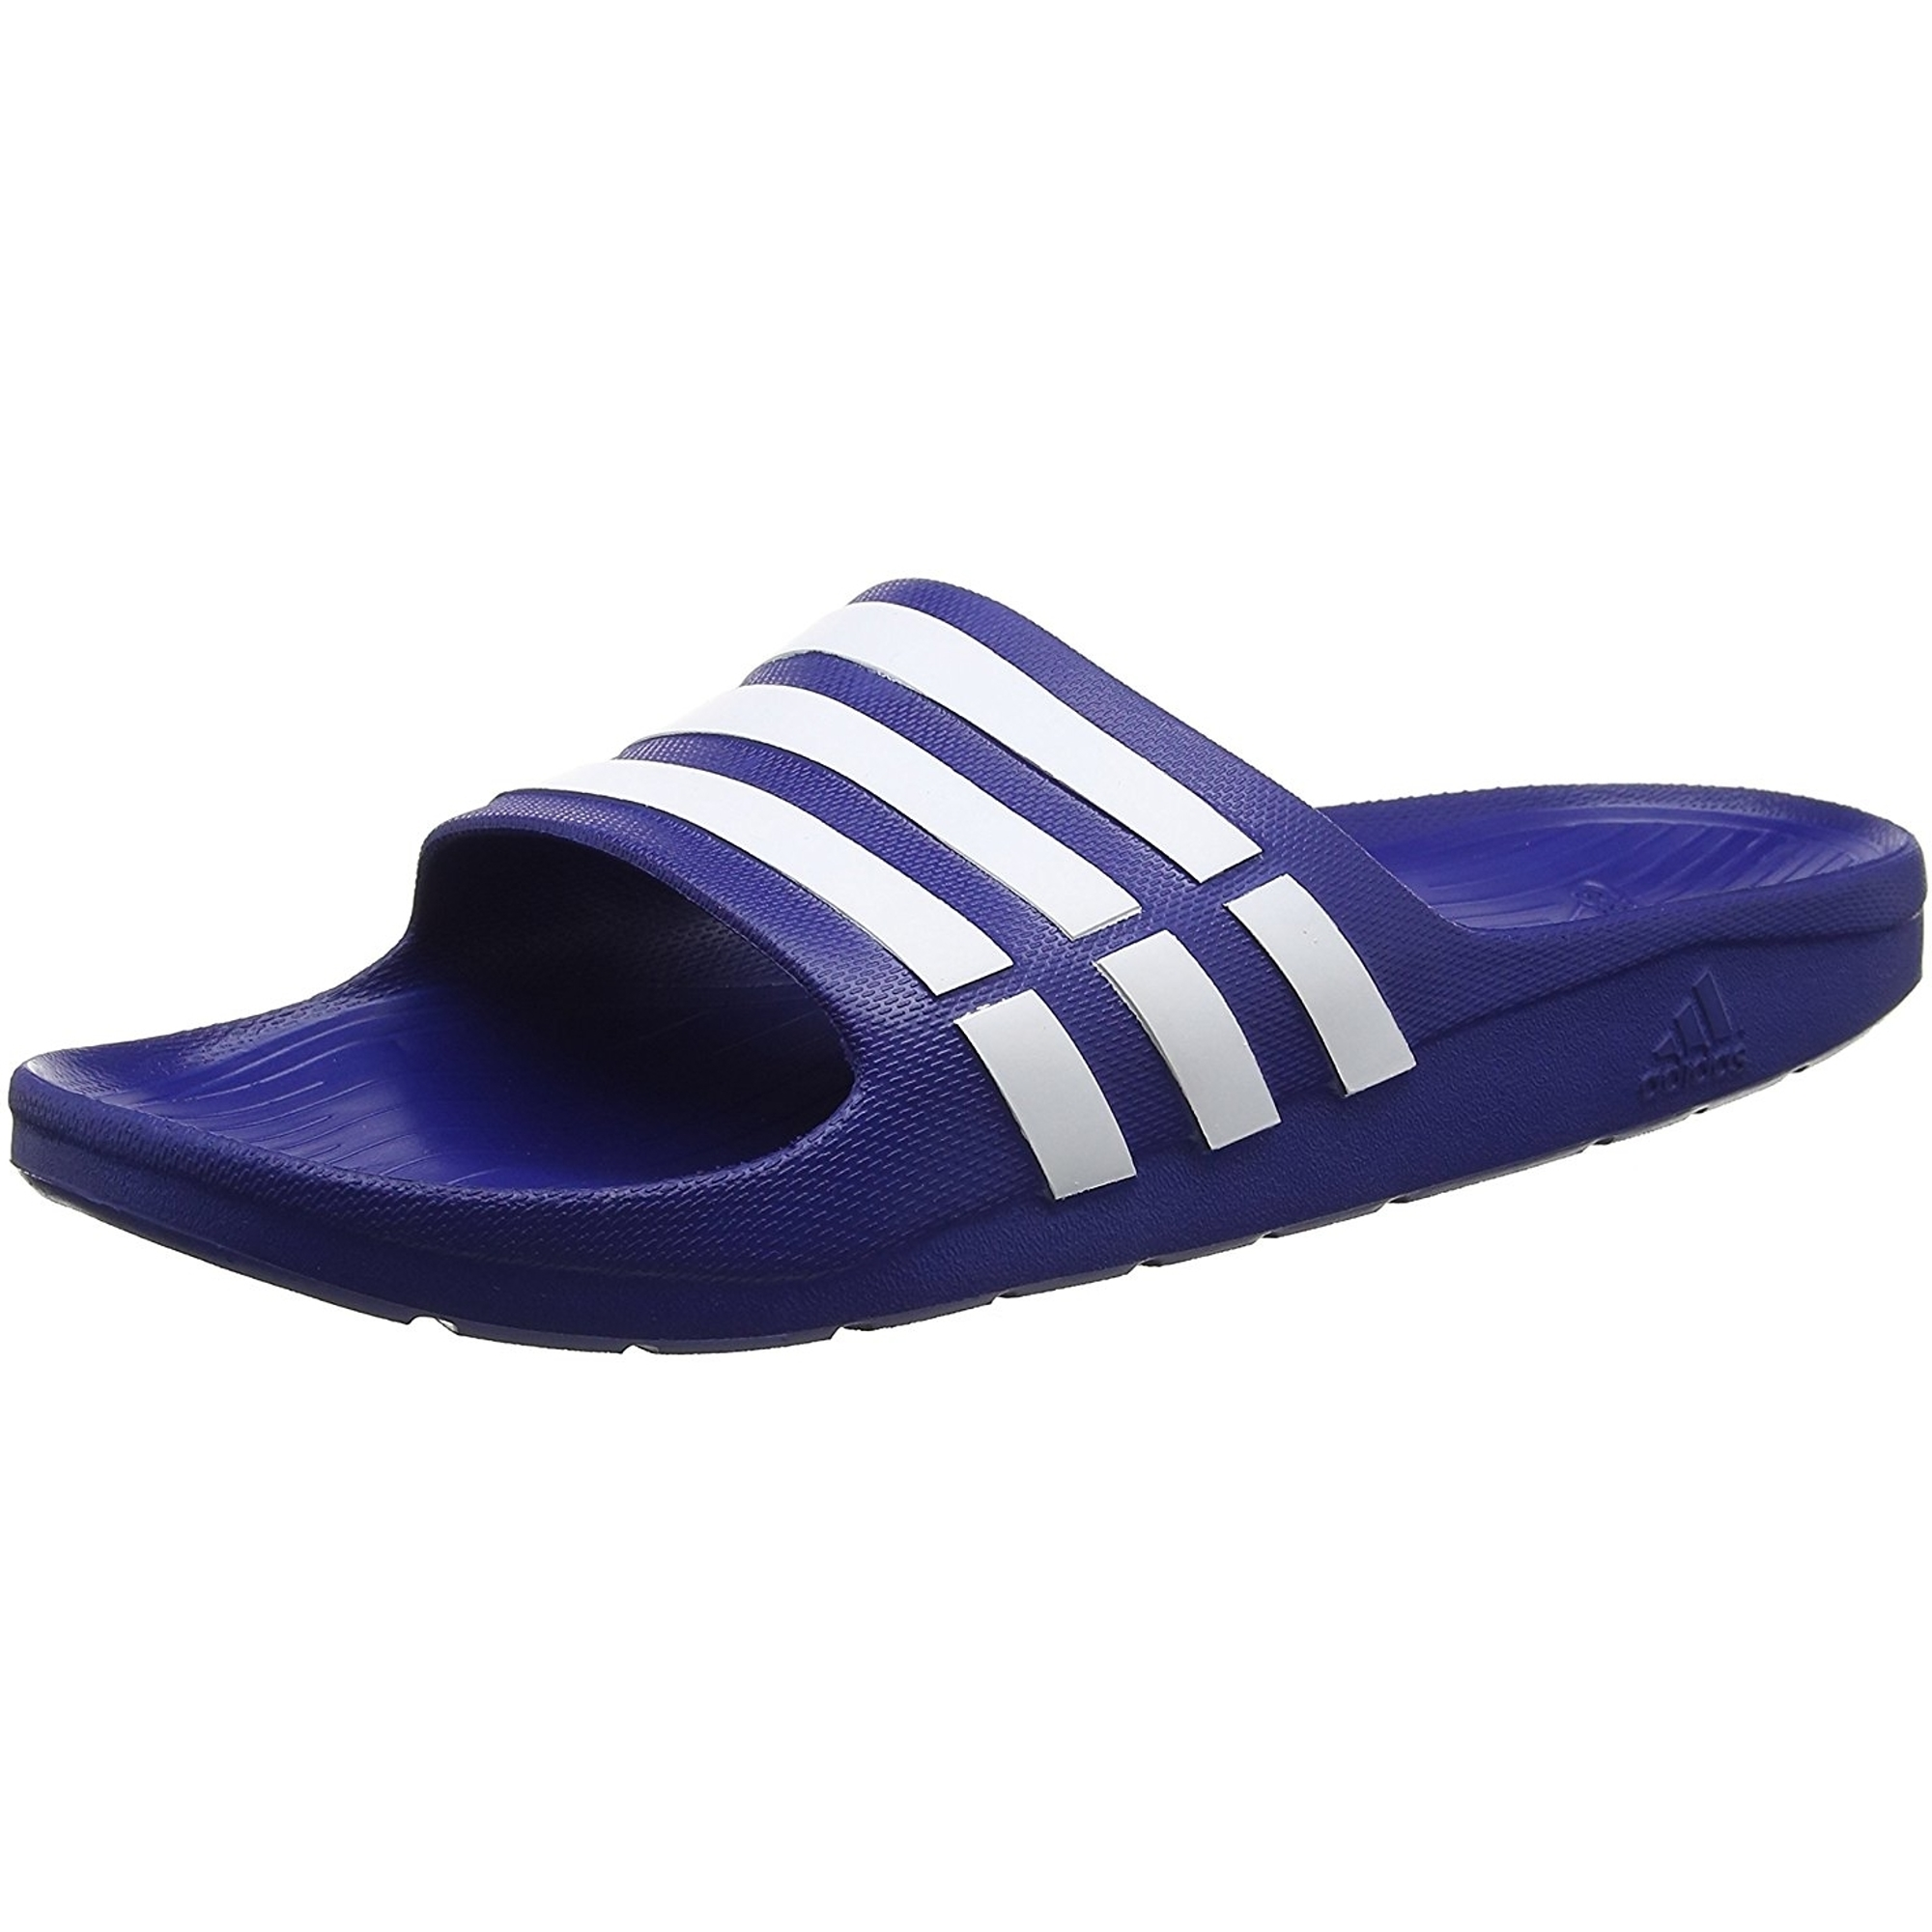 adidas Children/'s Duramo Slide Sandals 5 UK